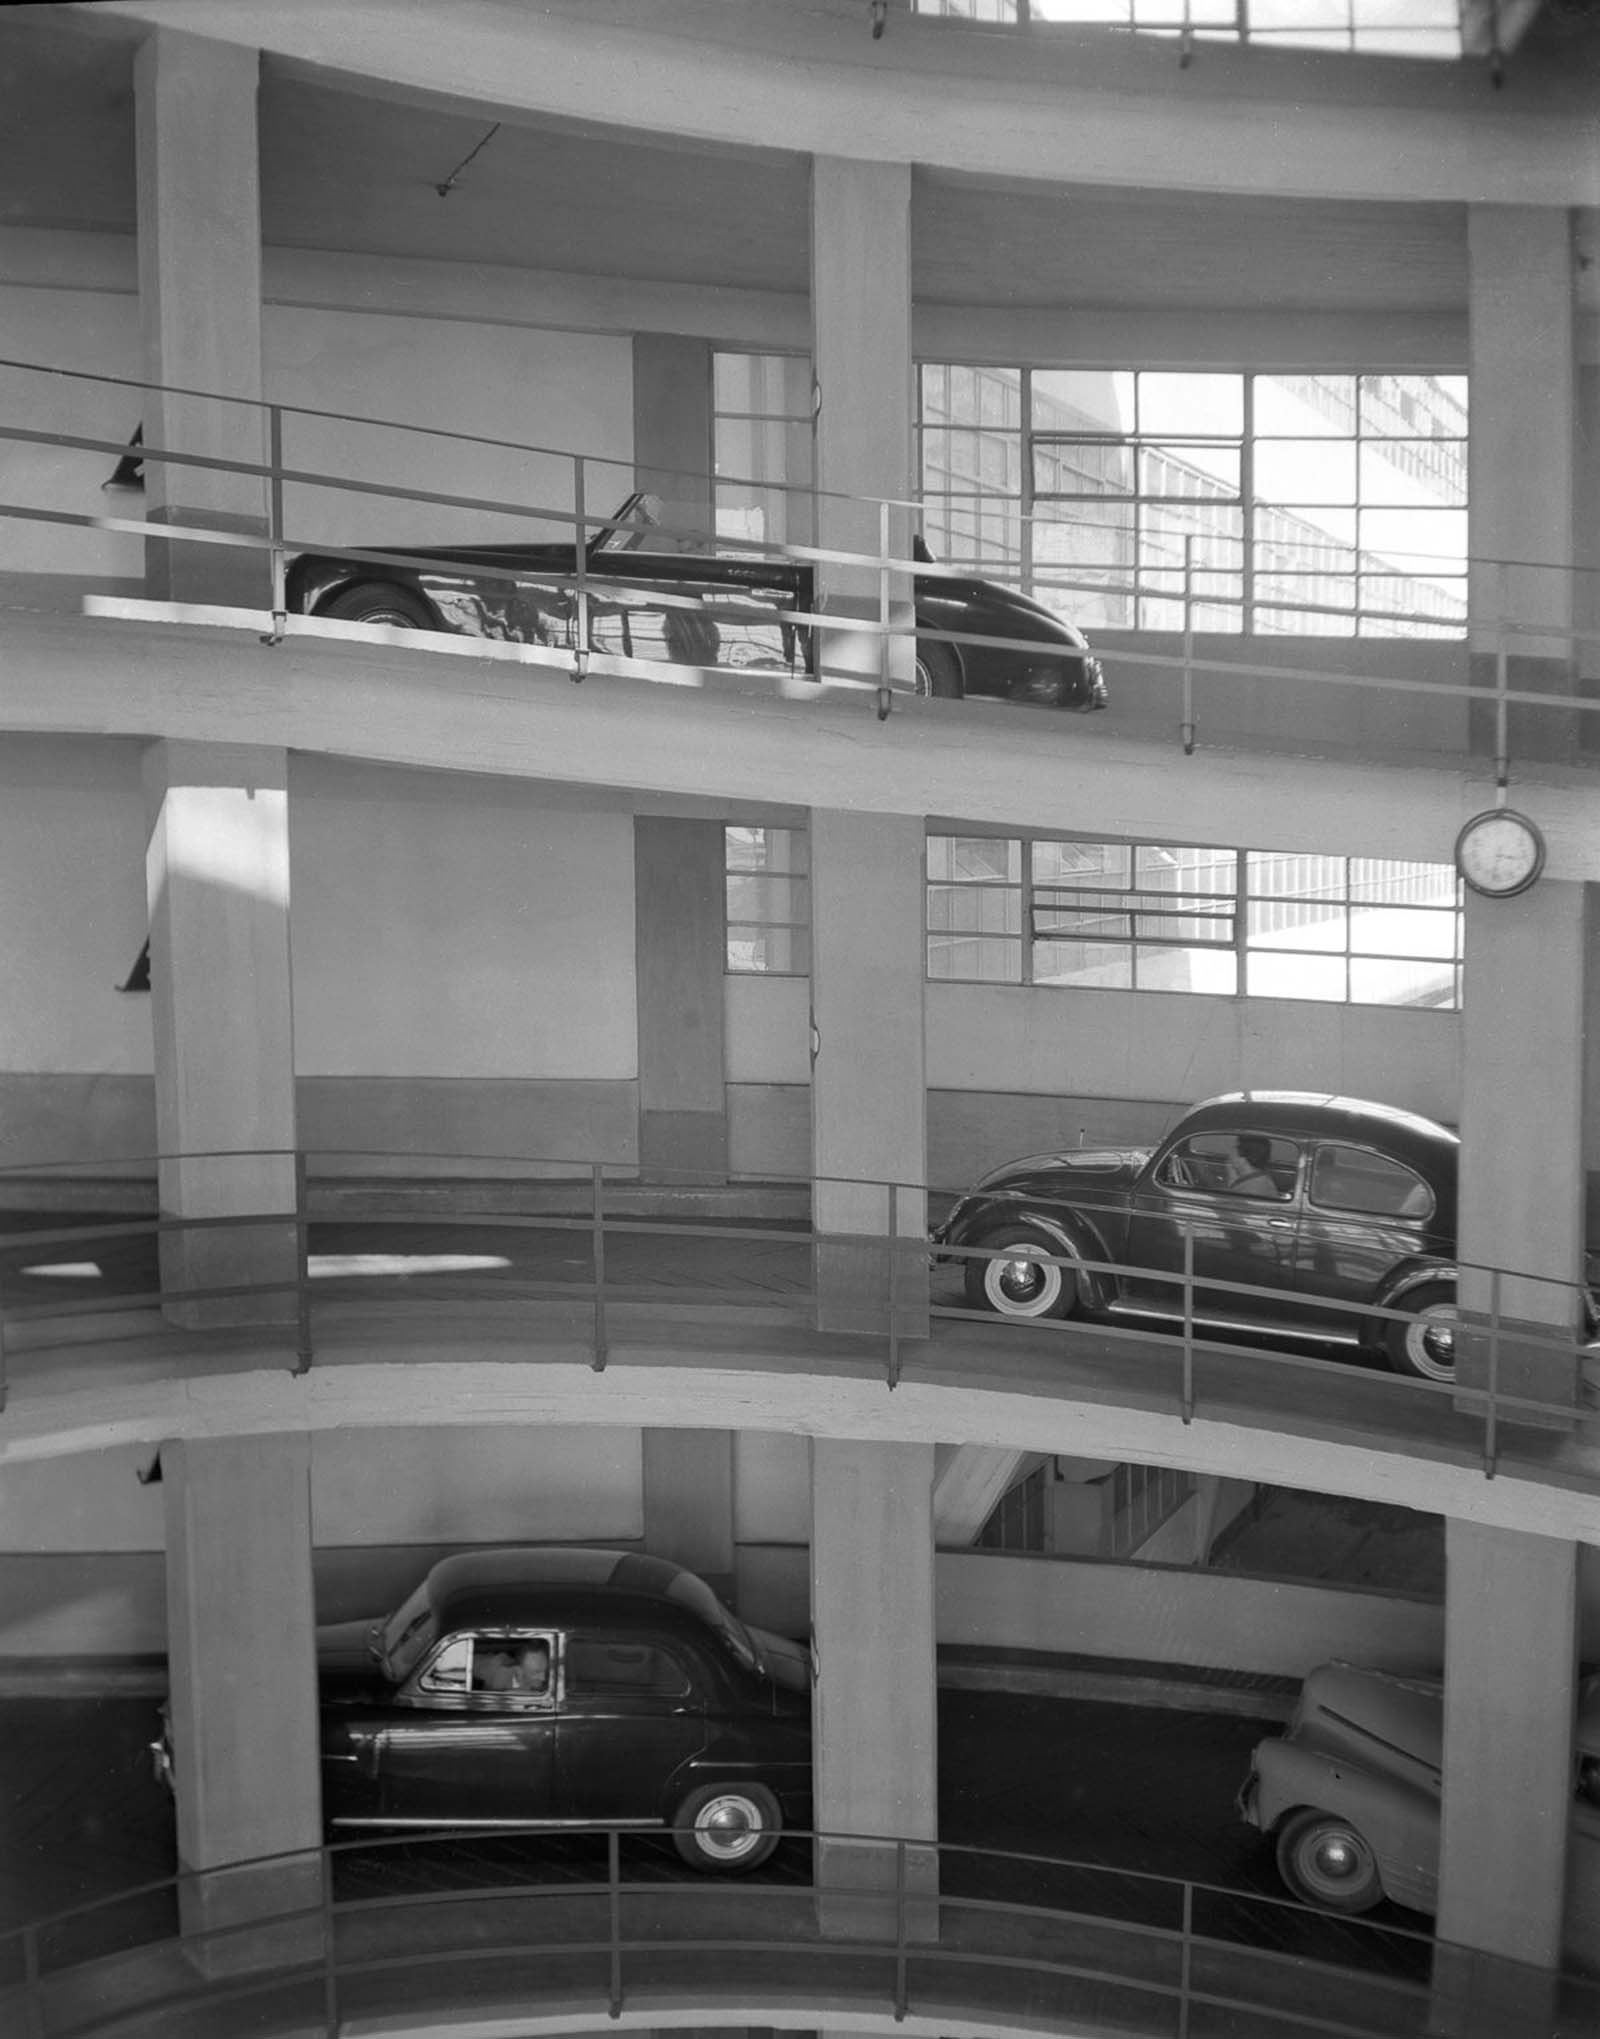 vintage photographs of early vertical parking garages